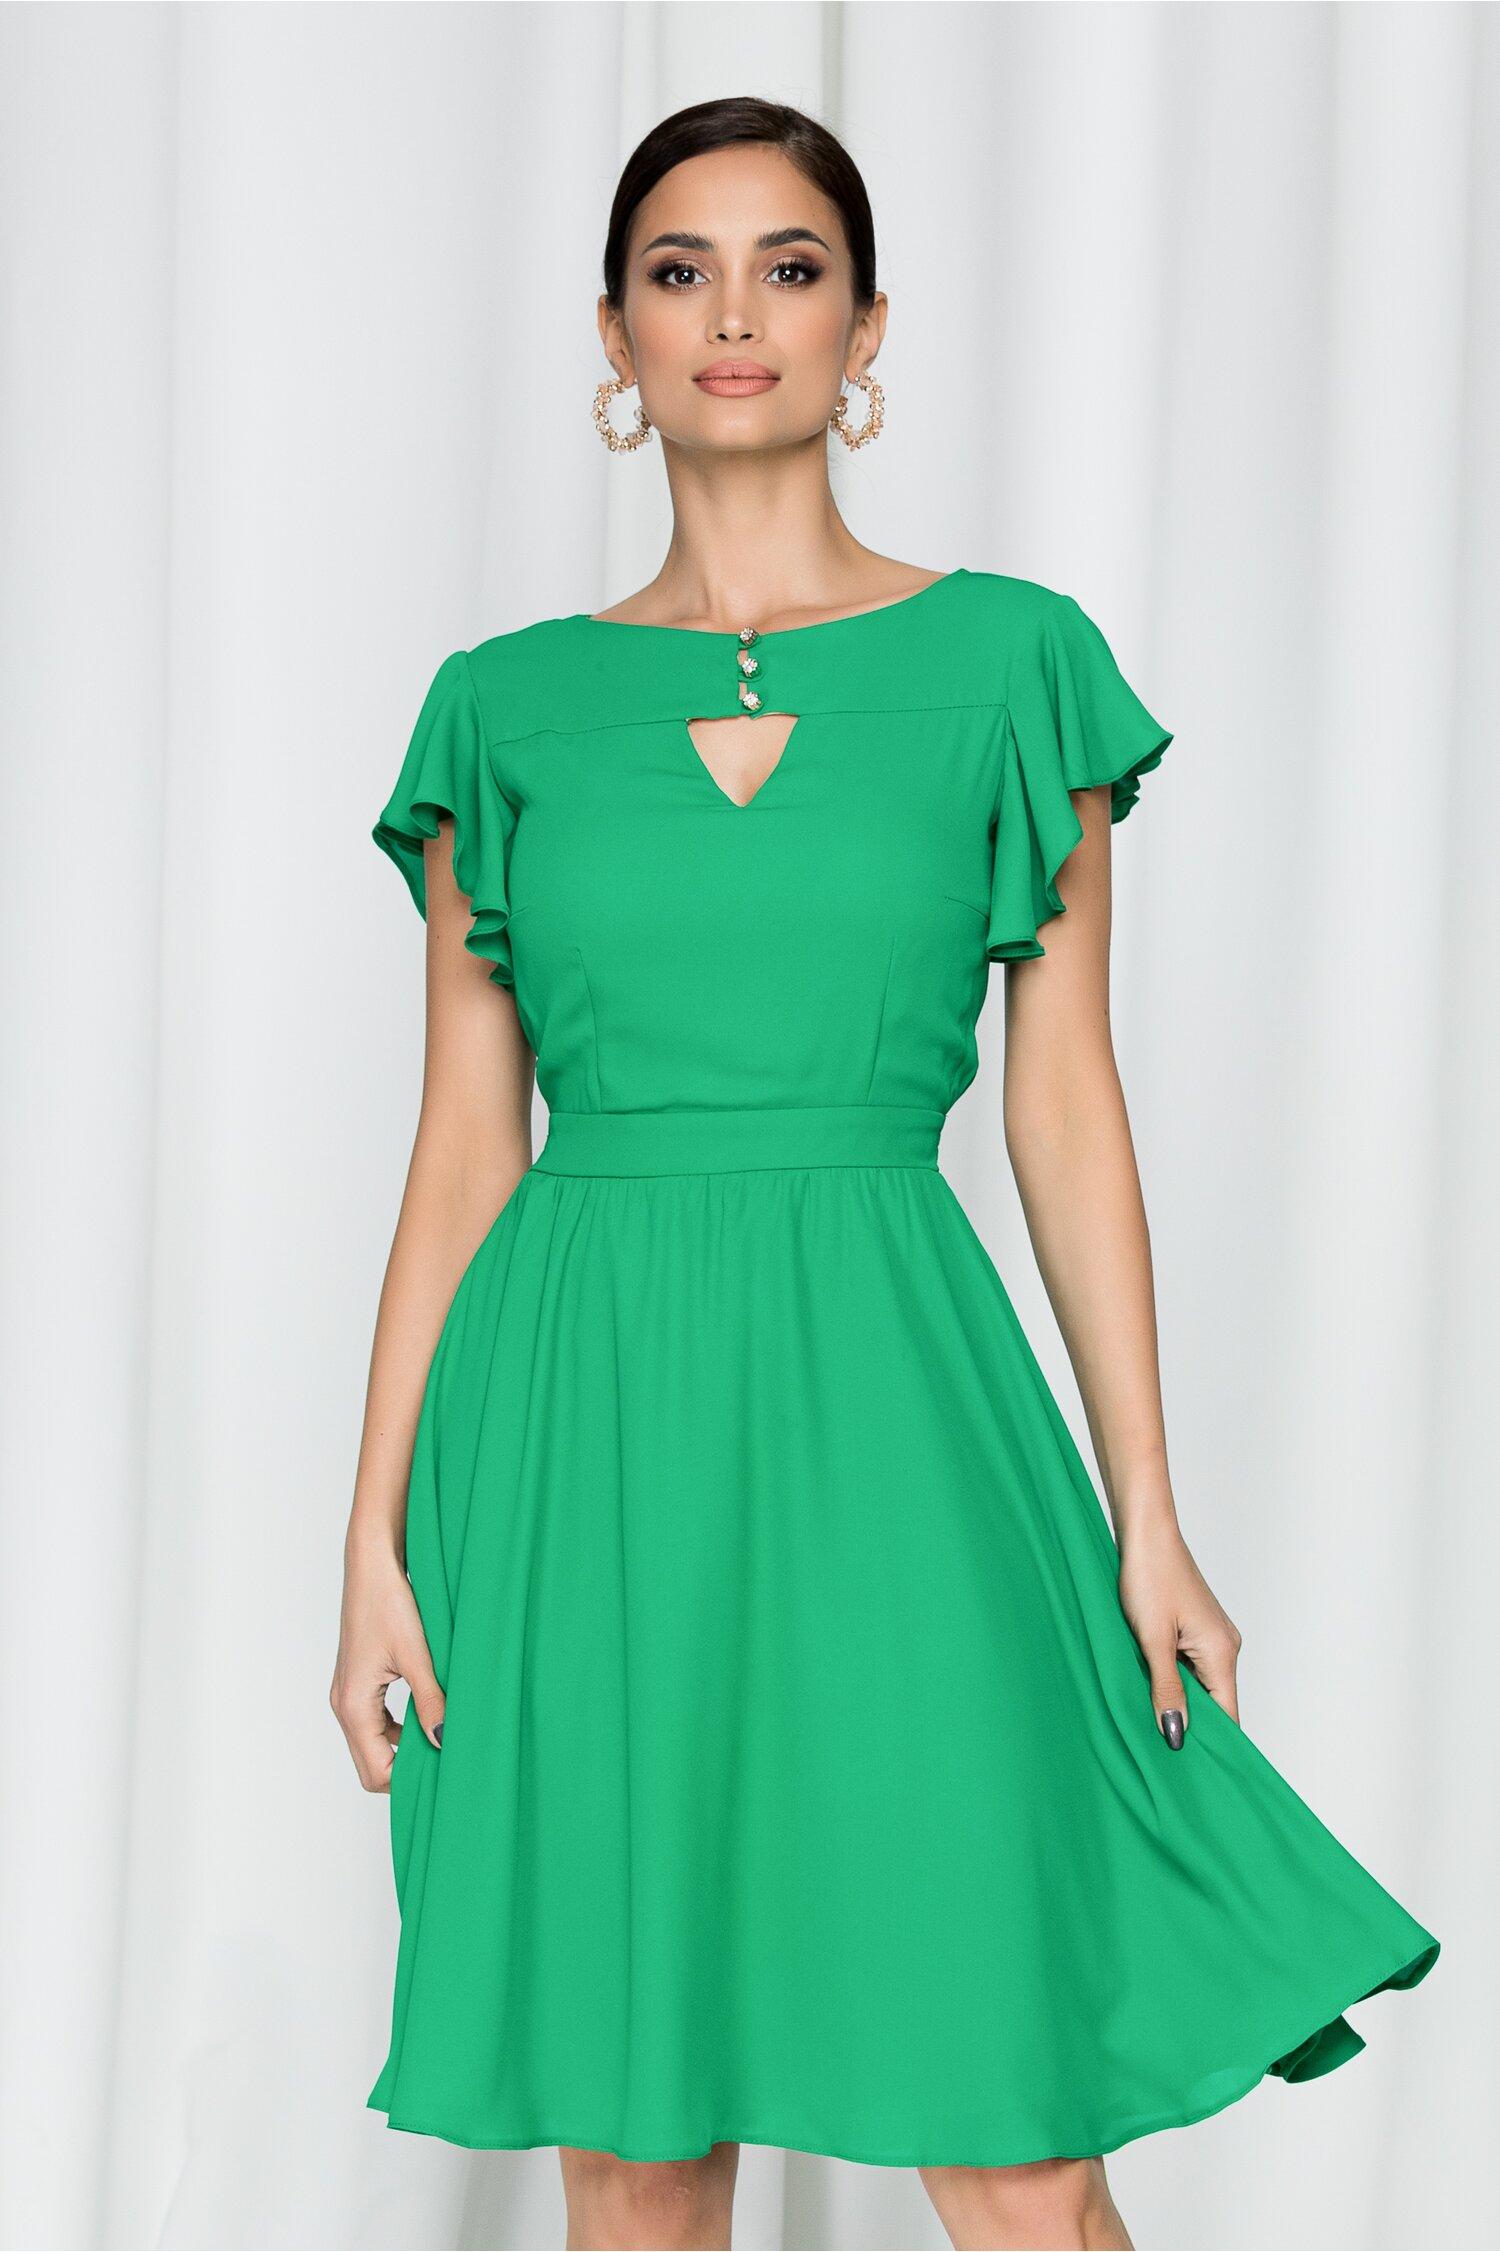 Rochie LaDonna by DyFashion verde cu maneci scurte accesorizate cu volanas